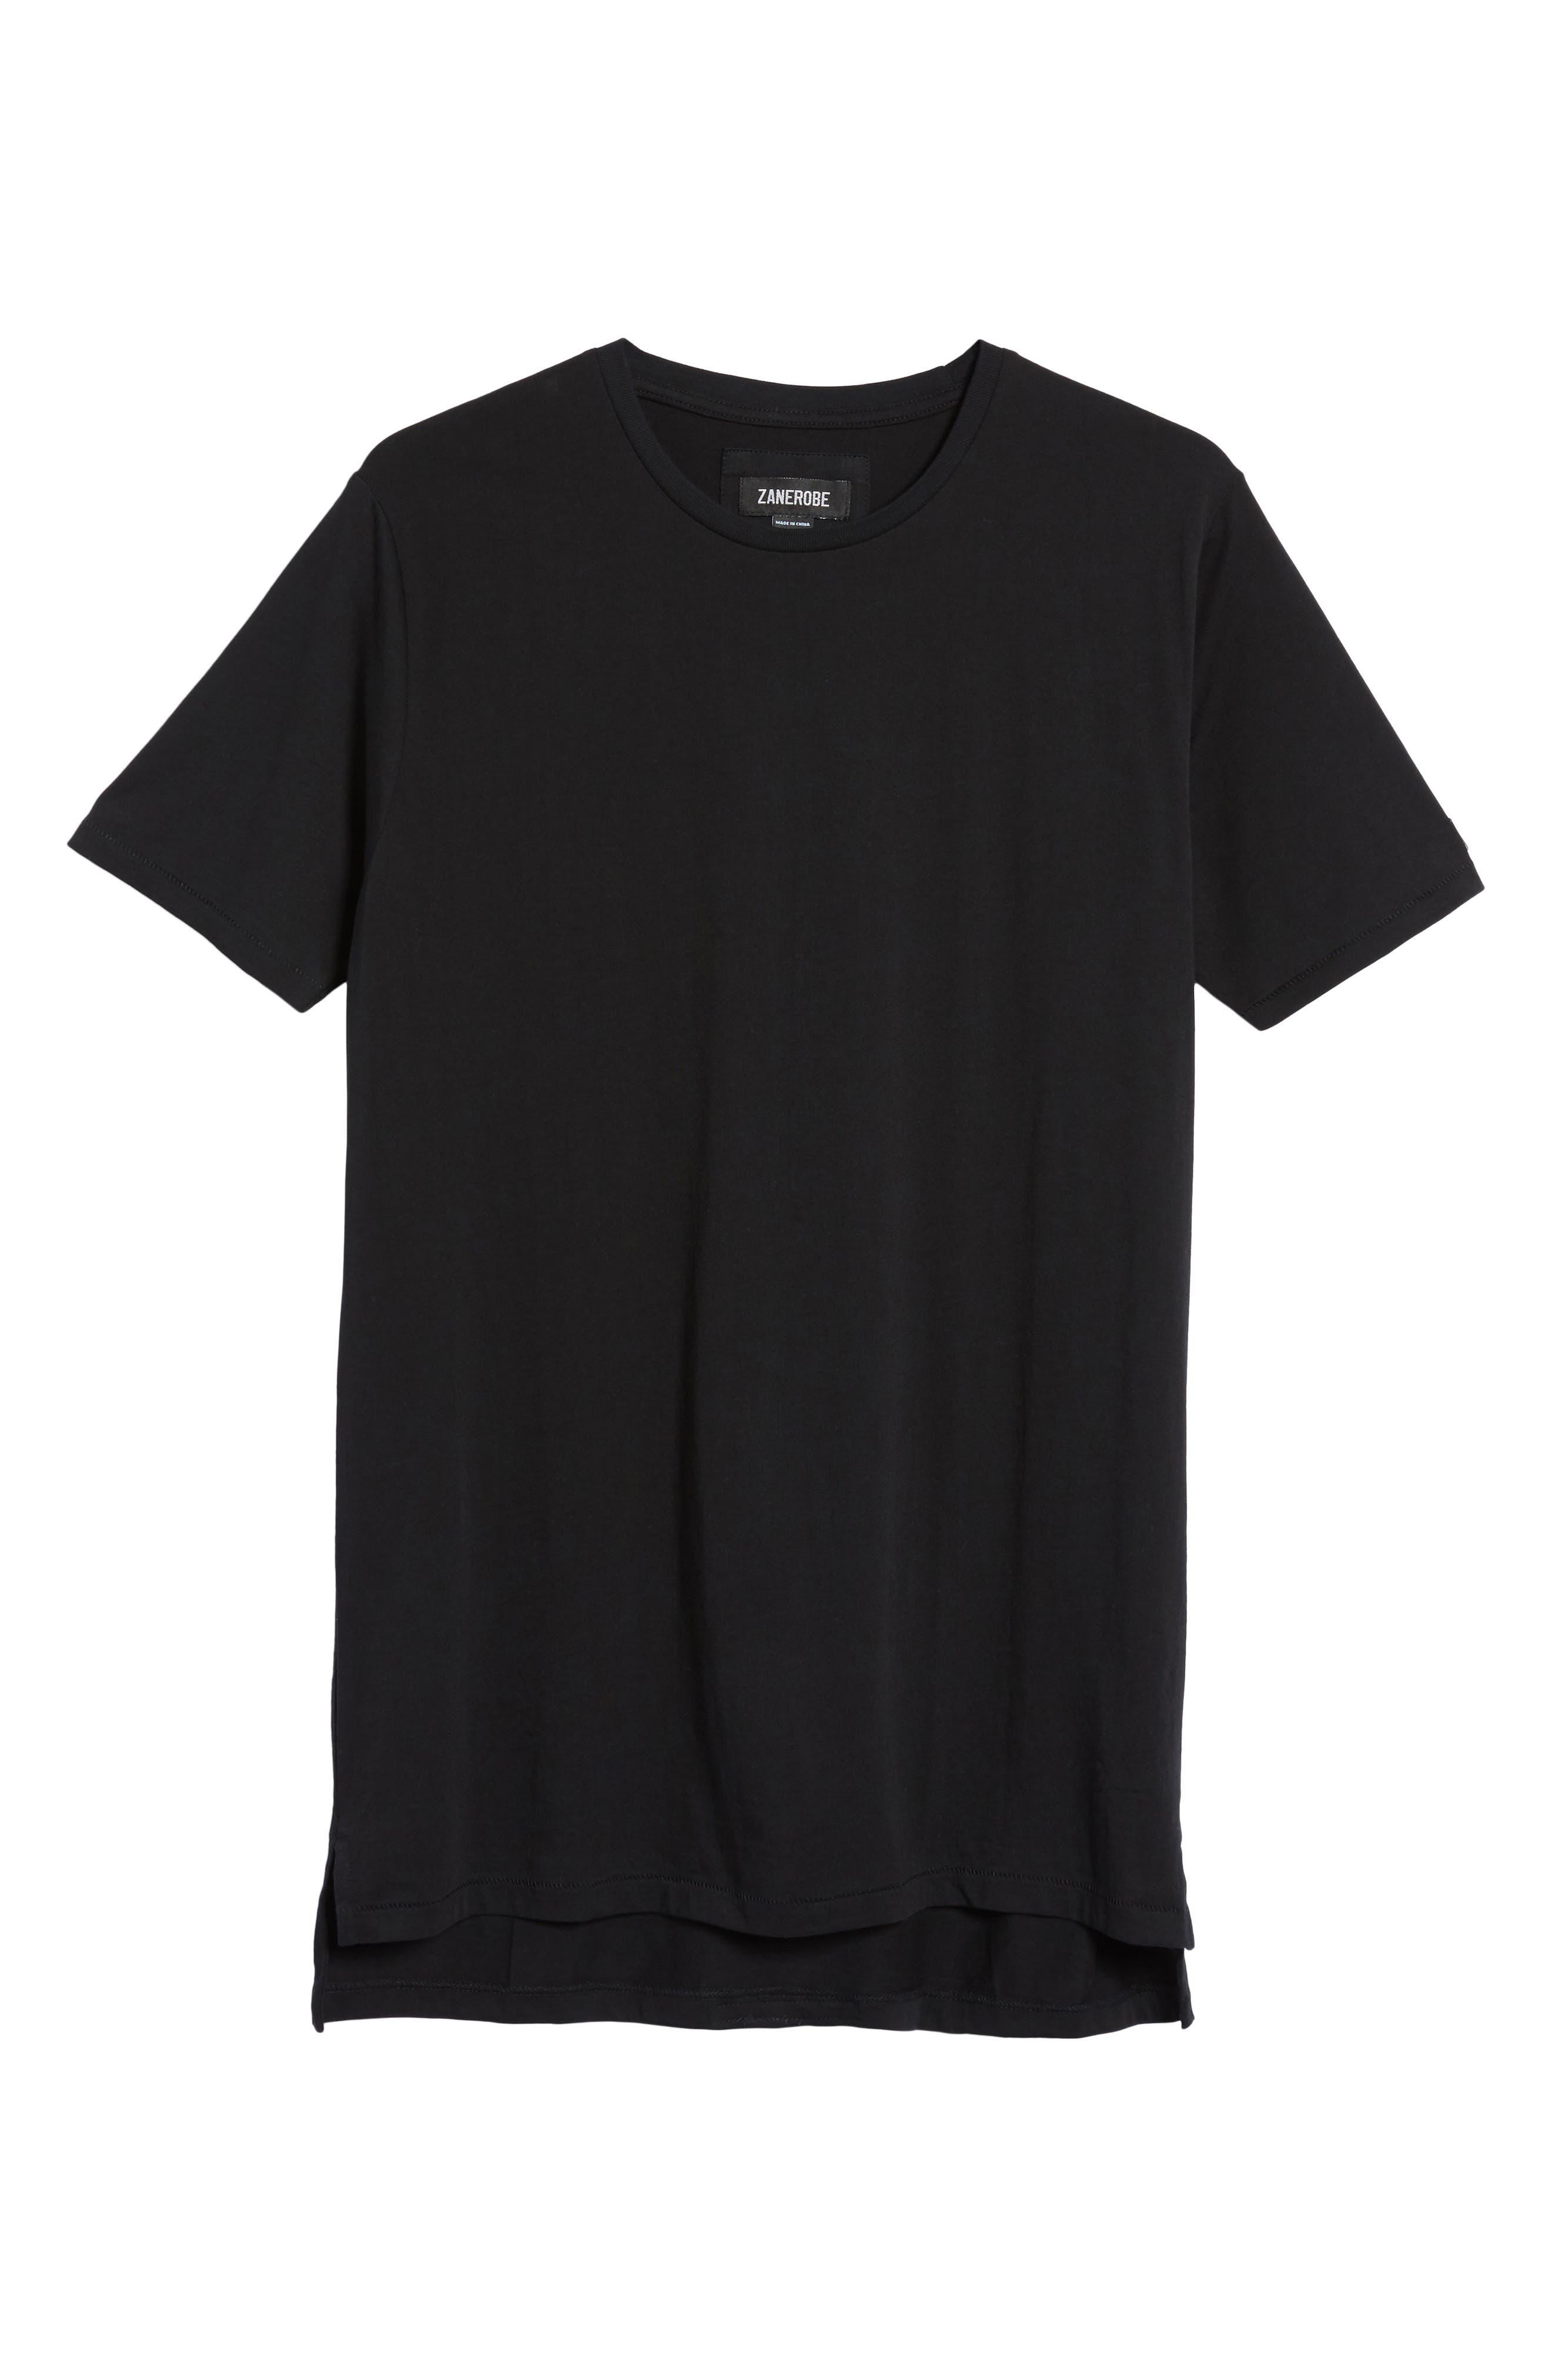 Tenacitee Mens Living in Alaska with Delaware Roots T-Shirt